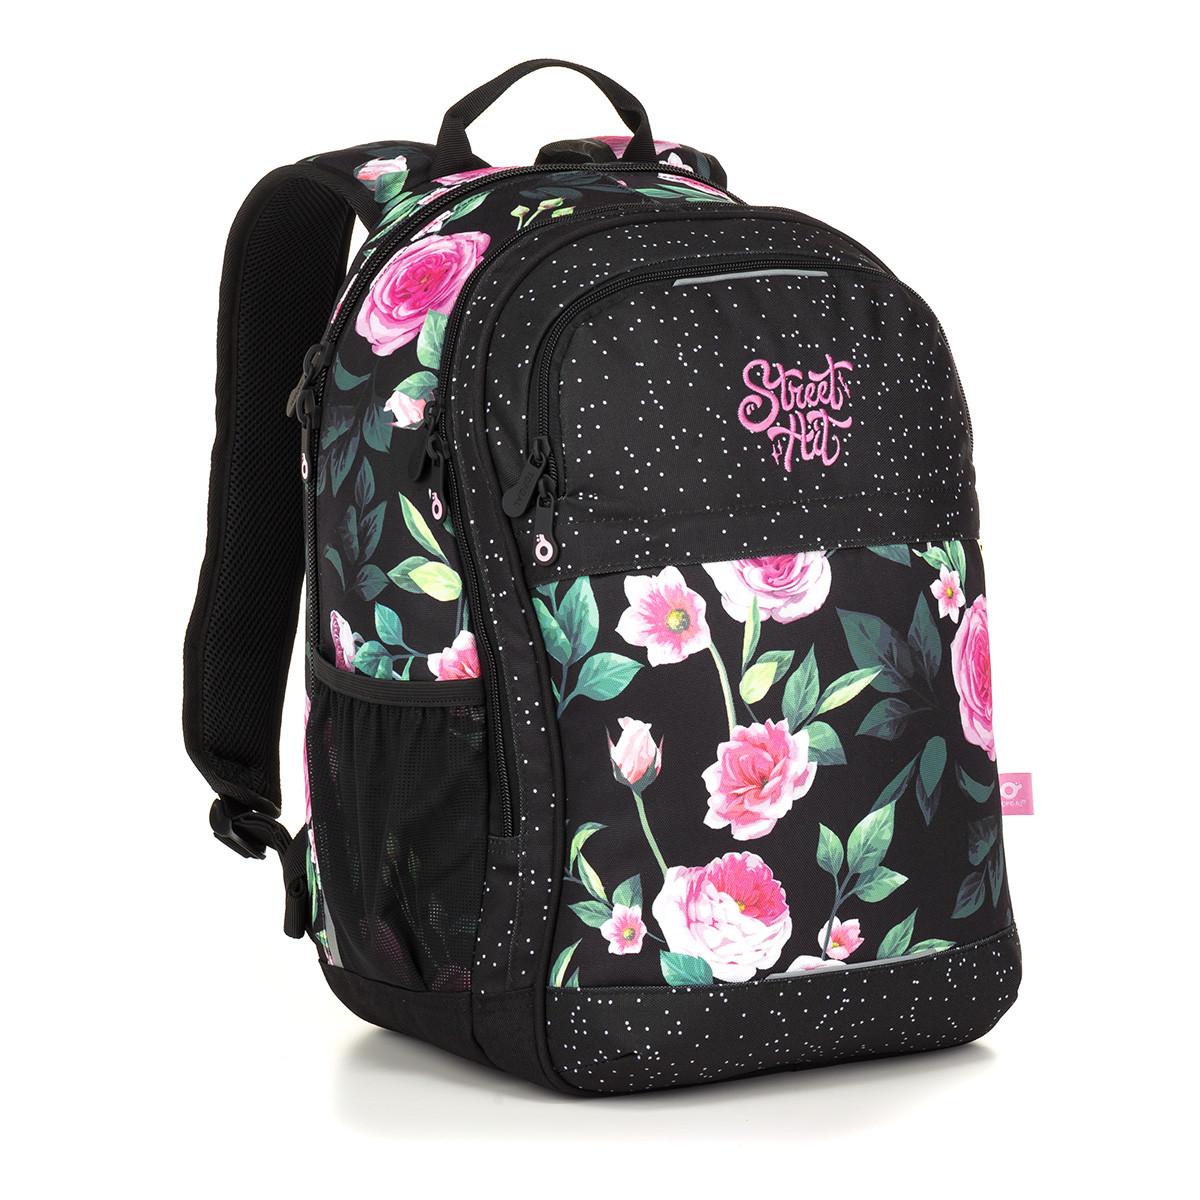 837831af383 Studentský batoh Topgal - RUBI 18025 G